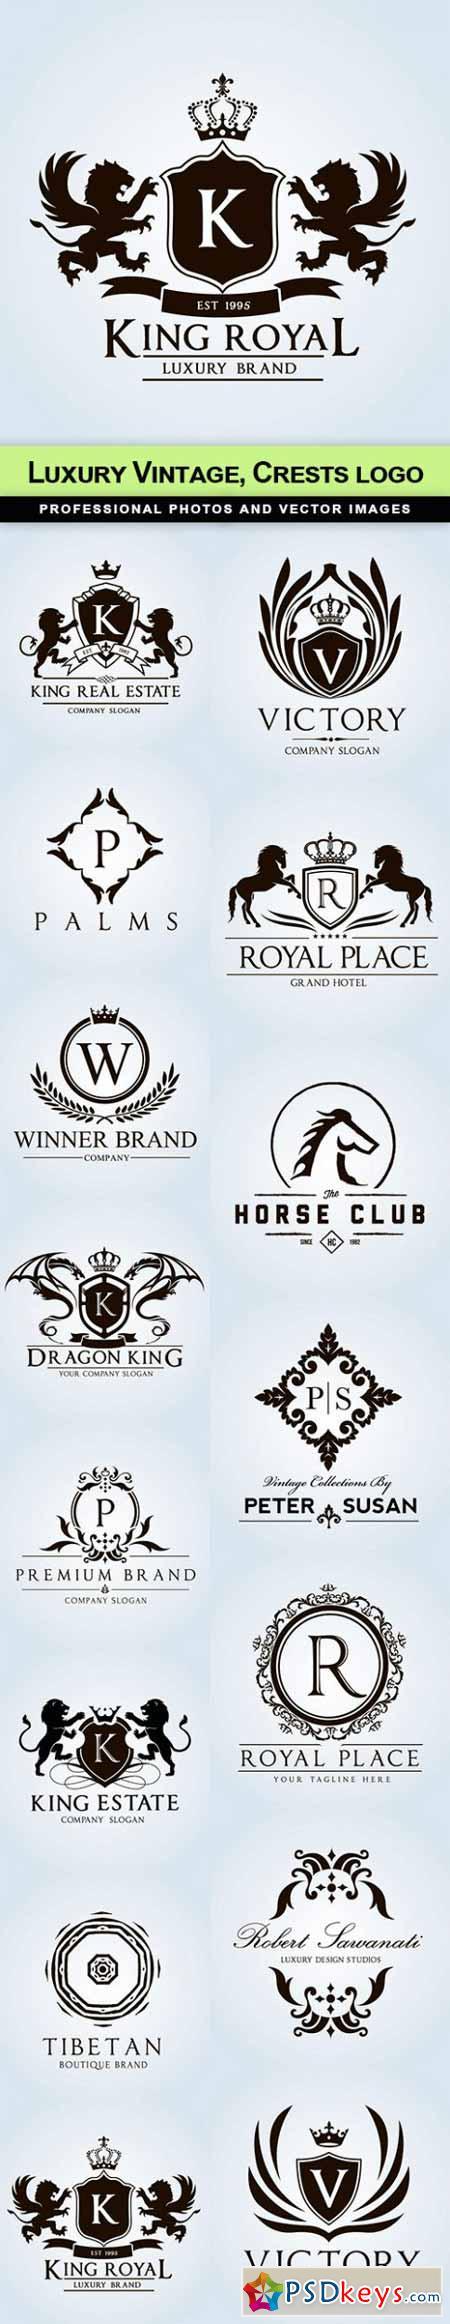 Luxury Vintage, Crests logo - 15 EPS